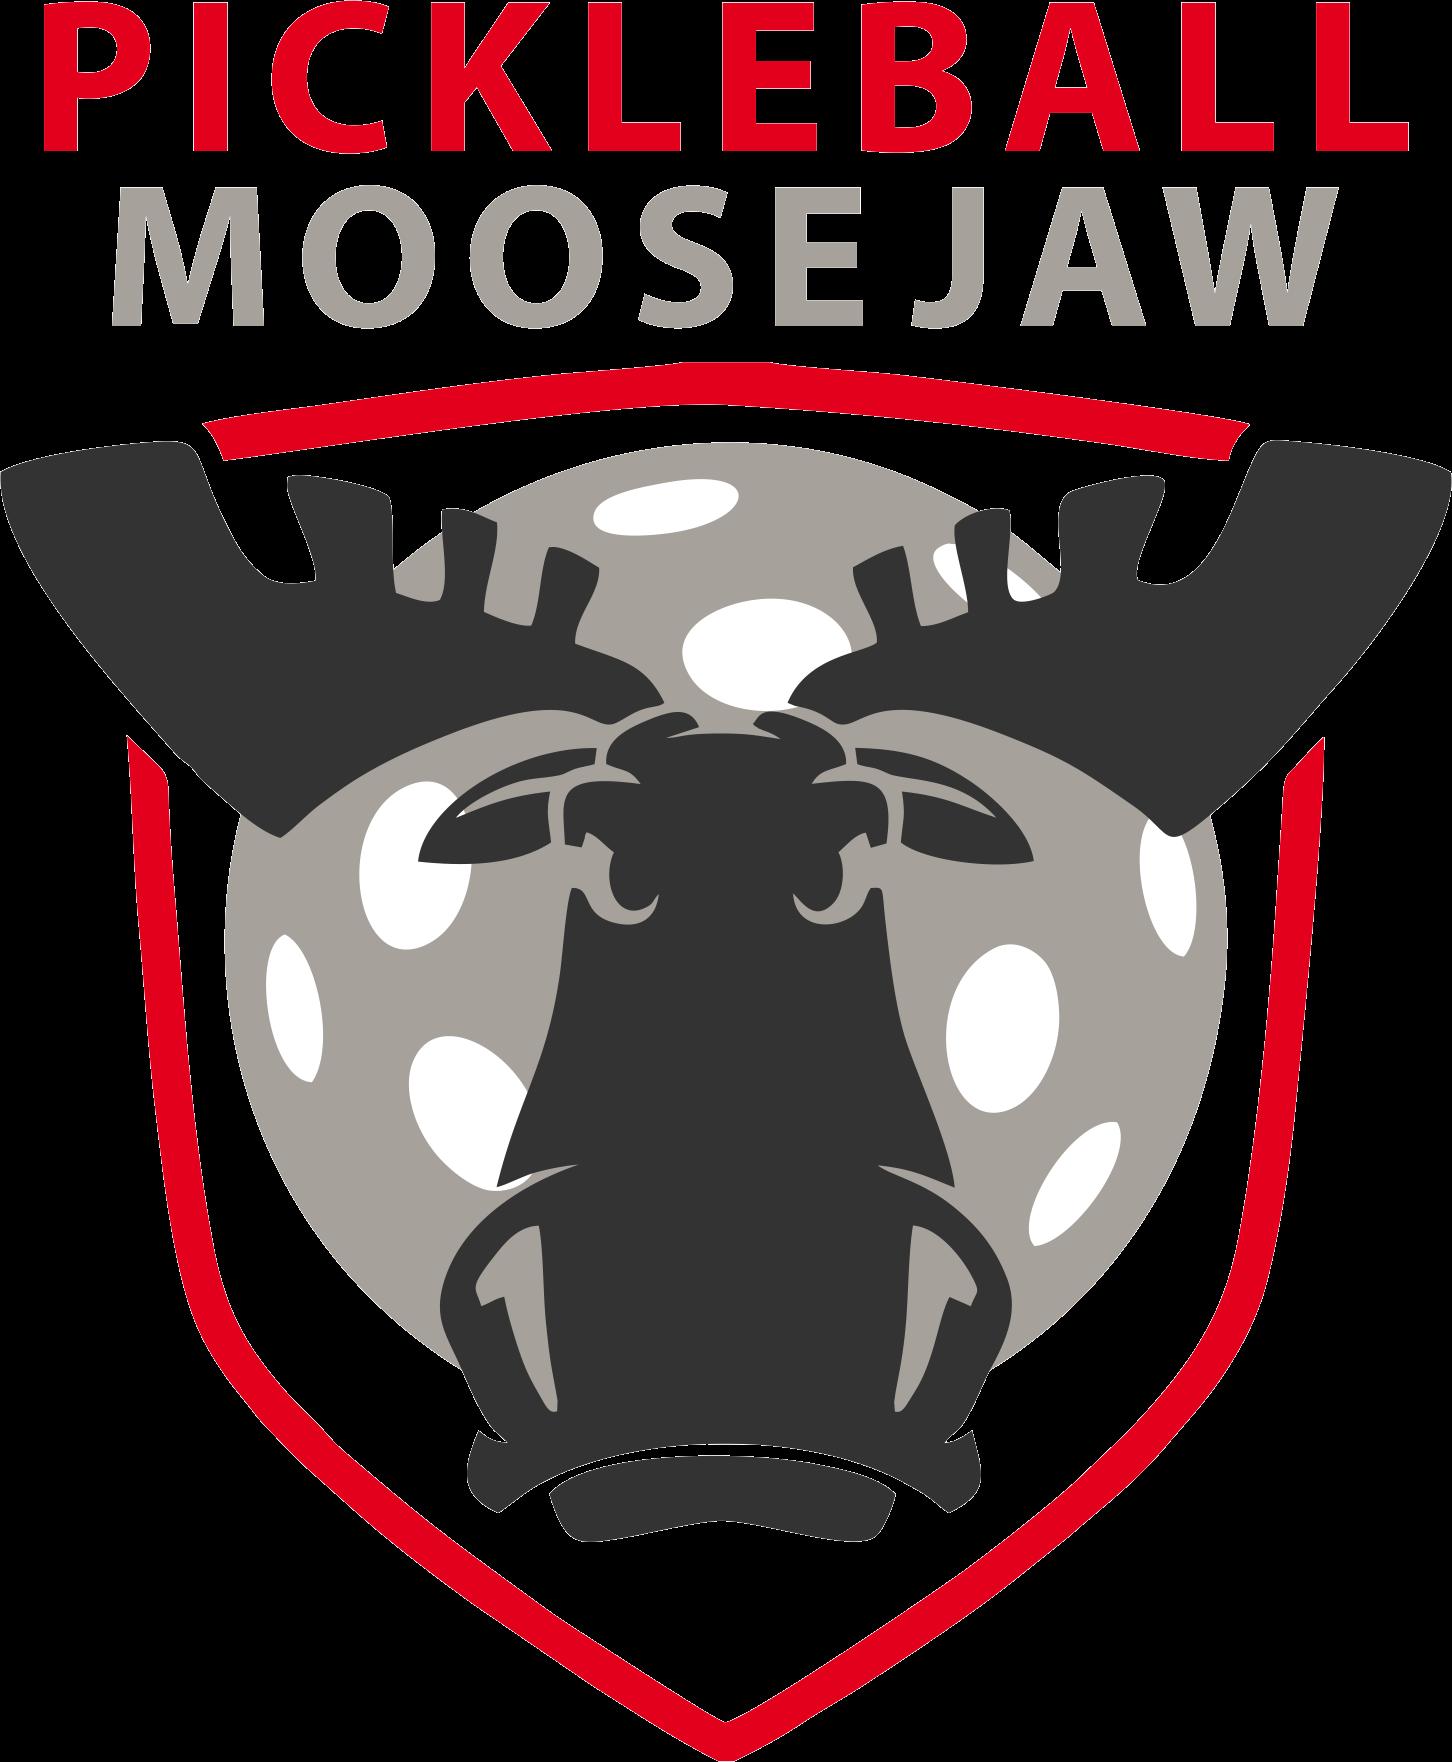 Pickleball Moose Jaw Inc.